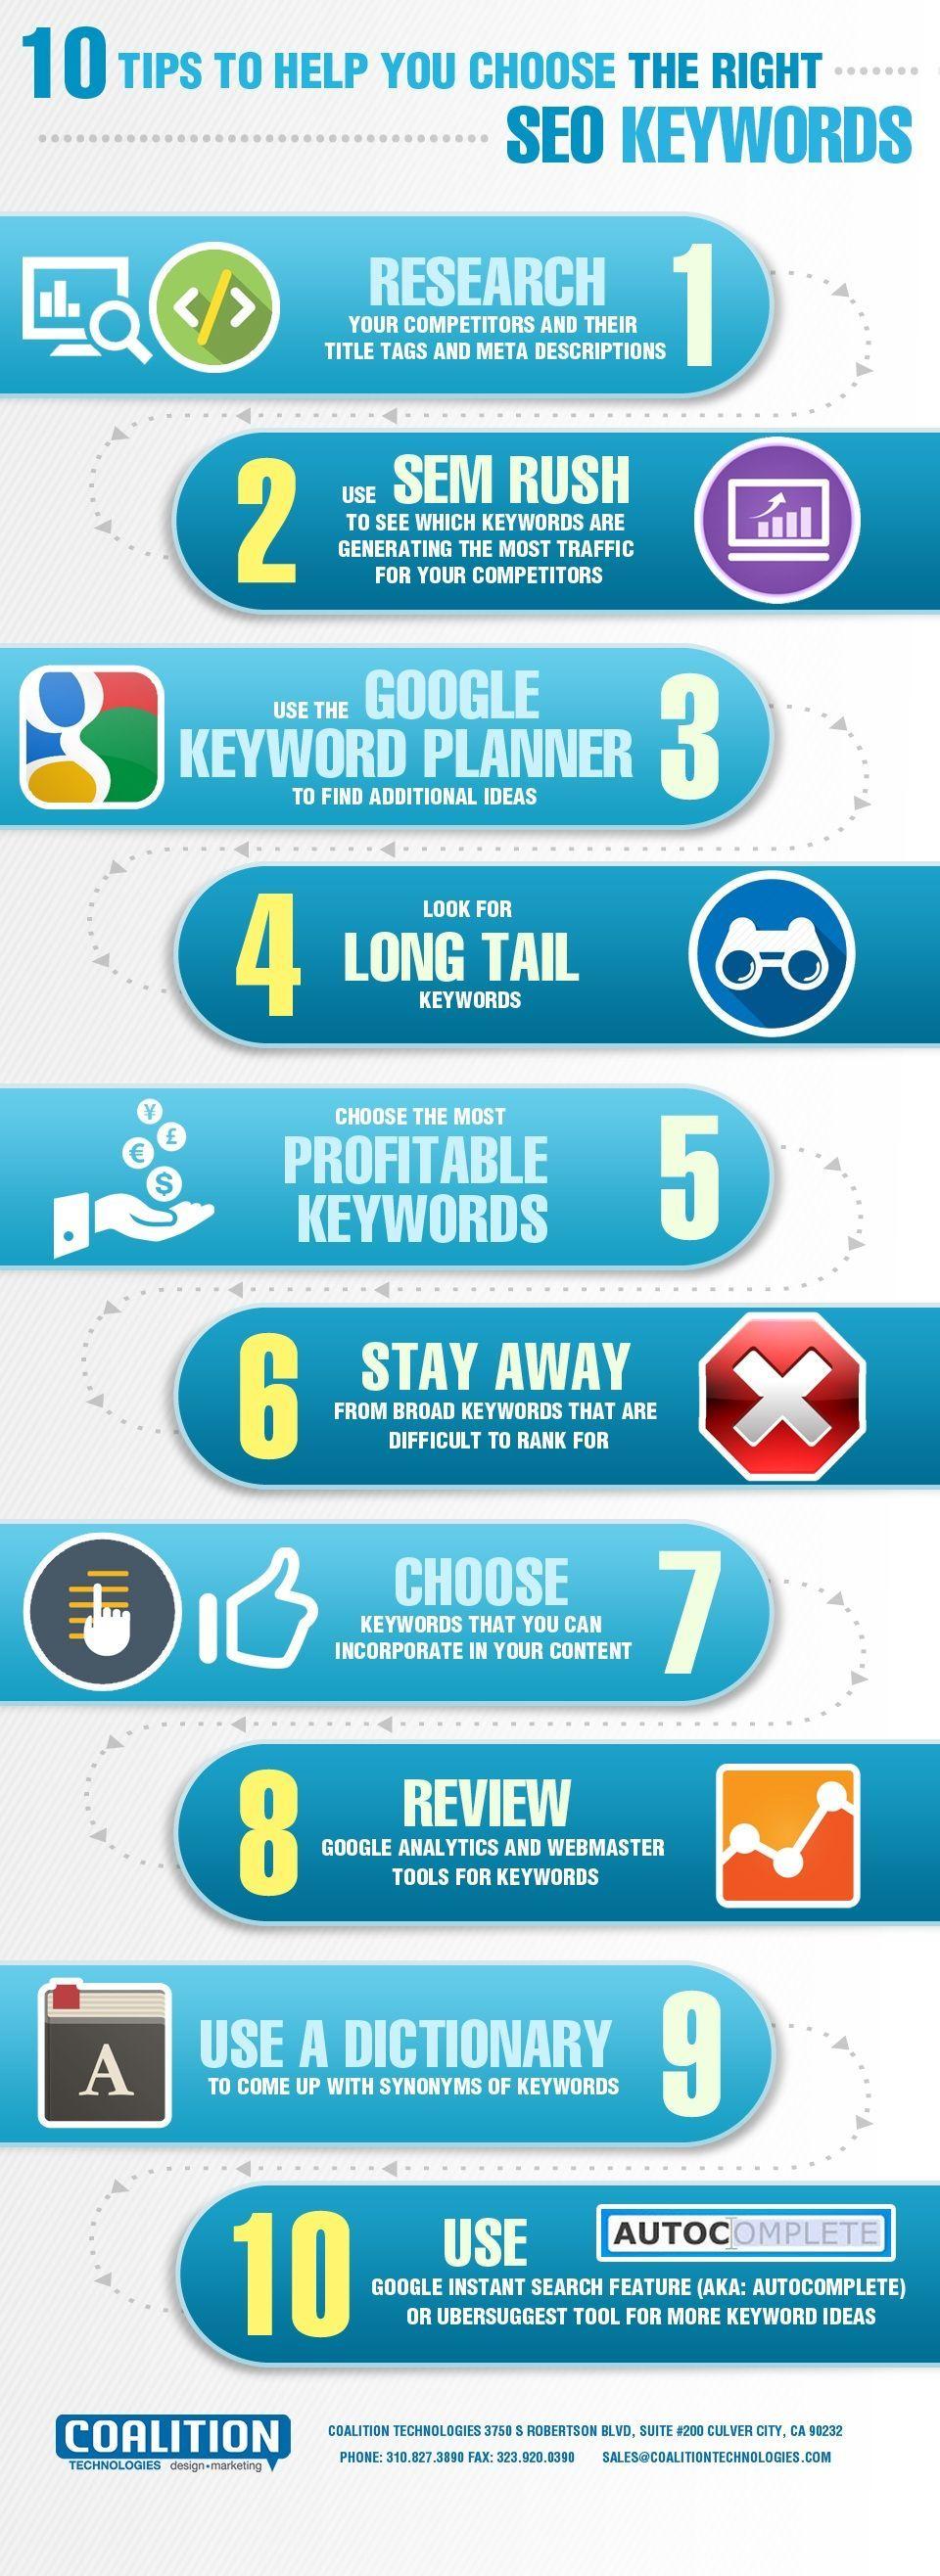 10 Tips To Choose Right Seo Keywords Seo Keywords Search Engine Marketing Seo Services